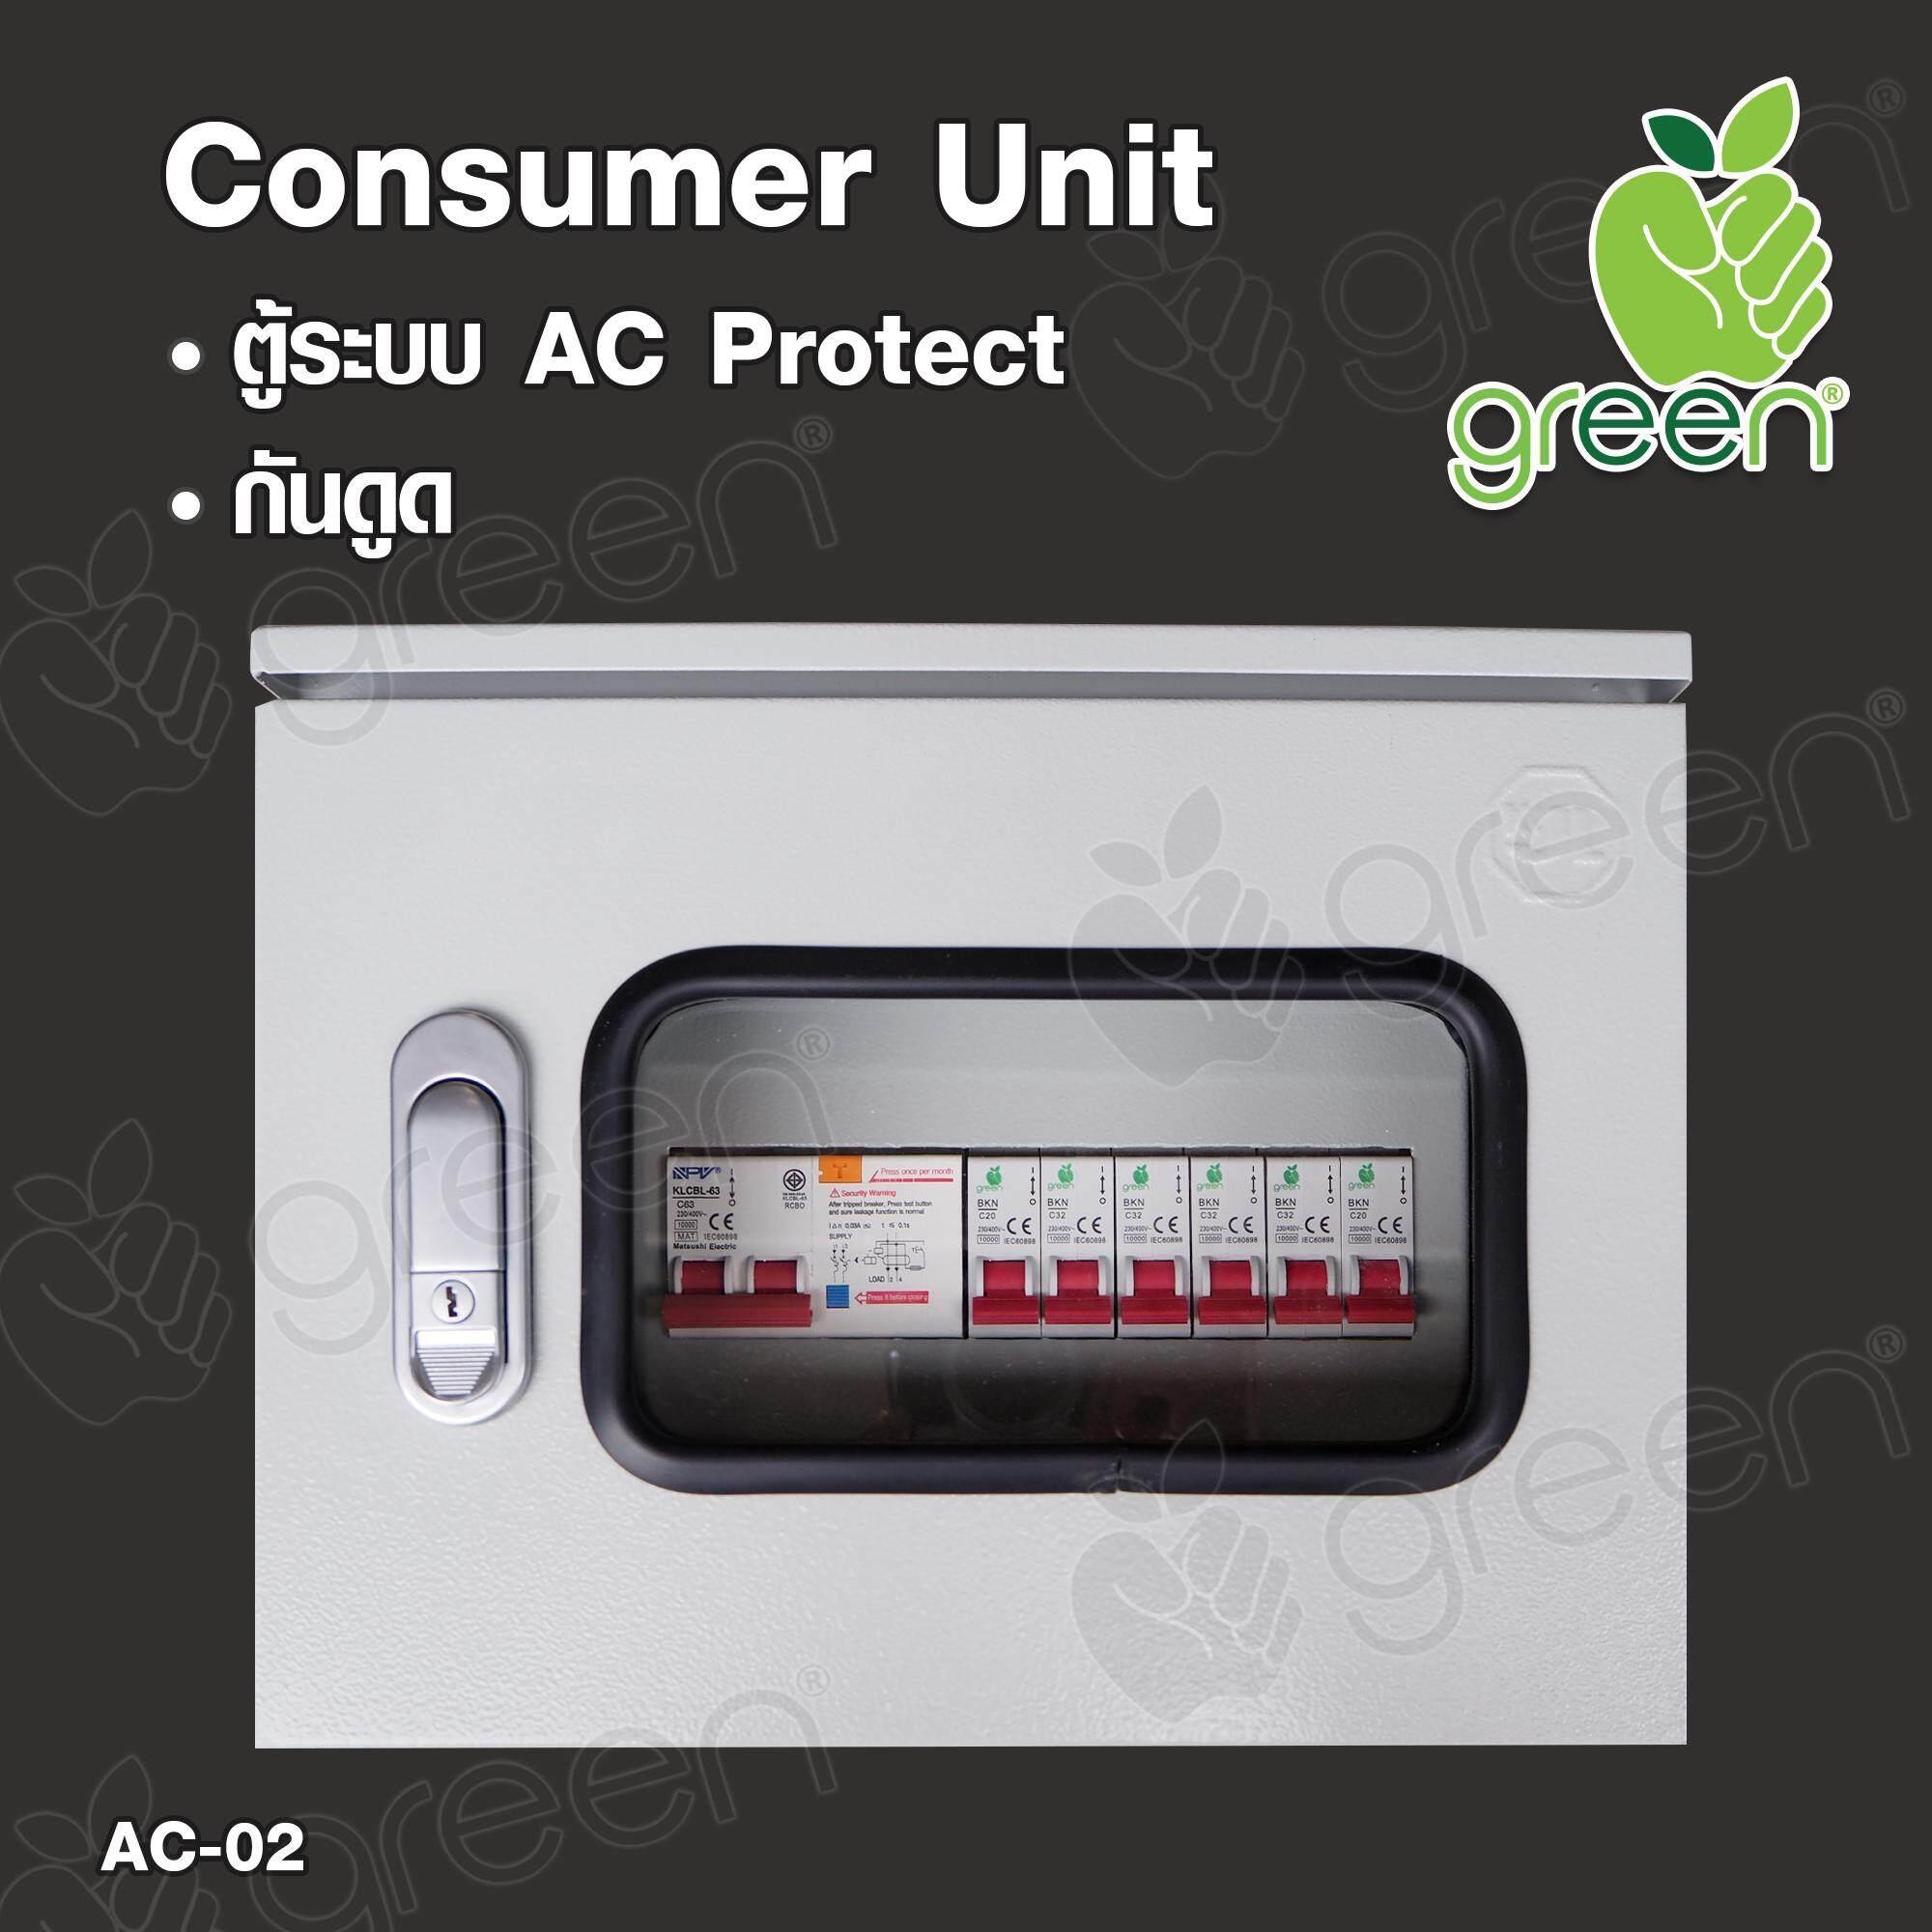 Applegreen Combiner Box Consumer Unit Ip65 Ac Breaker  เมนเซอกิตกันดูด 1 ลูกเซอกิต 6 ใช้กับไฟบ้าน ตู้เหล็ก กันน้ำ ฝา2ชั้น ใช้ภายนอกใน และ ภายนอกอาคาร สามารถเลือกสเปคนการประกอบได้.